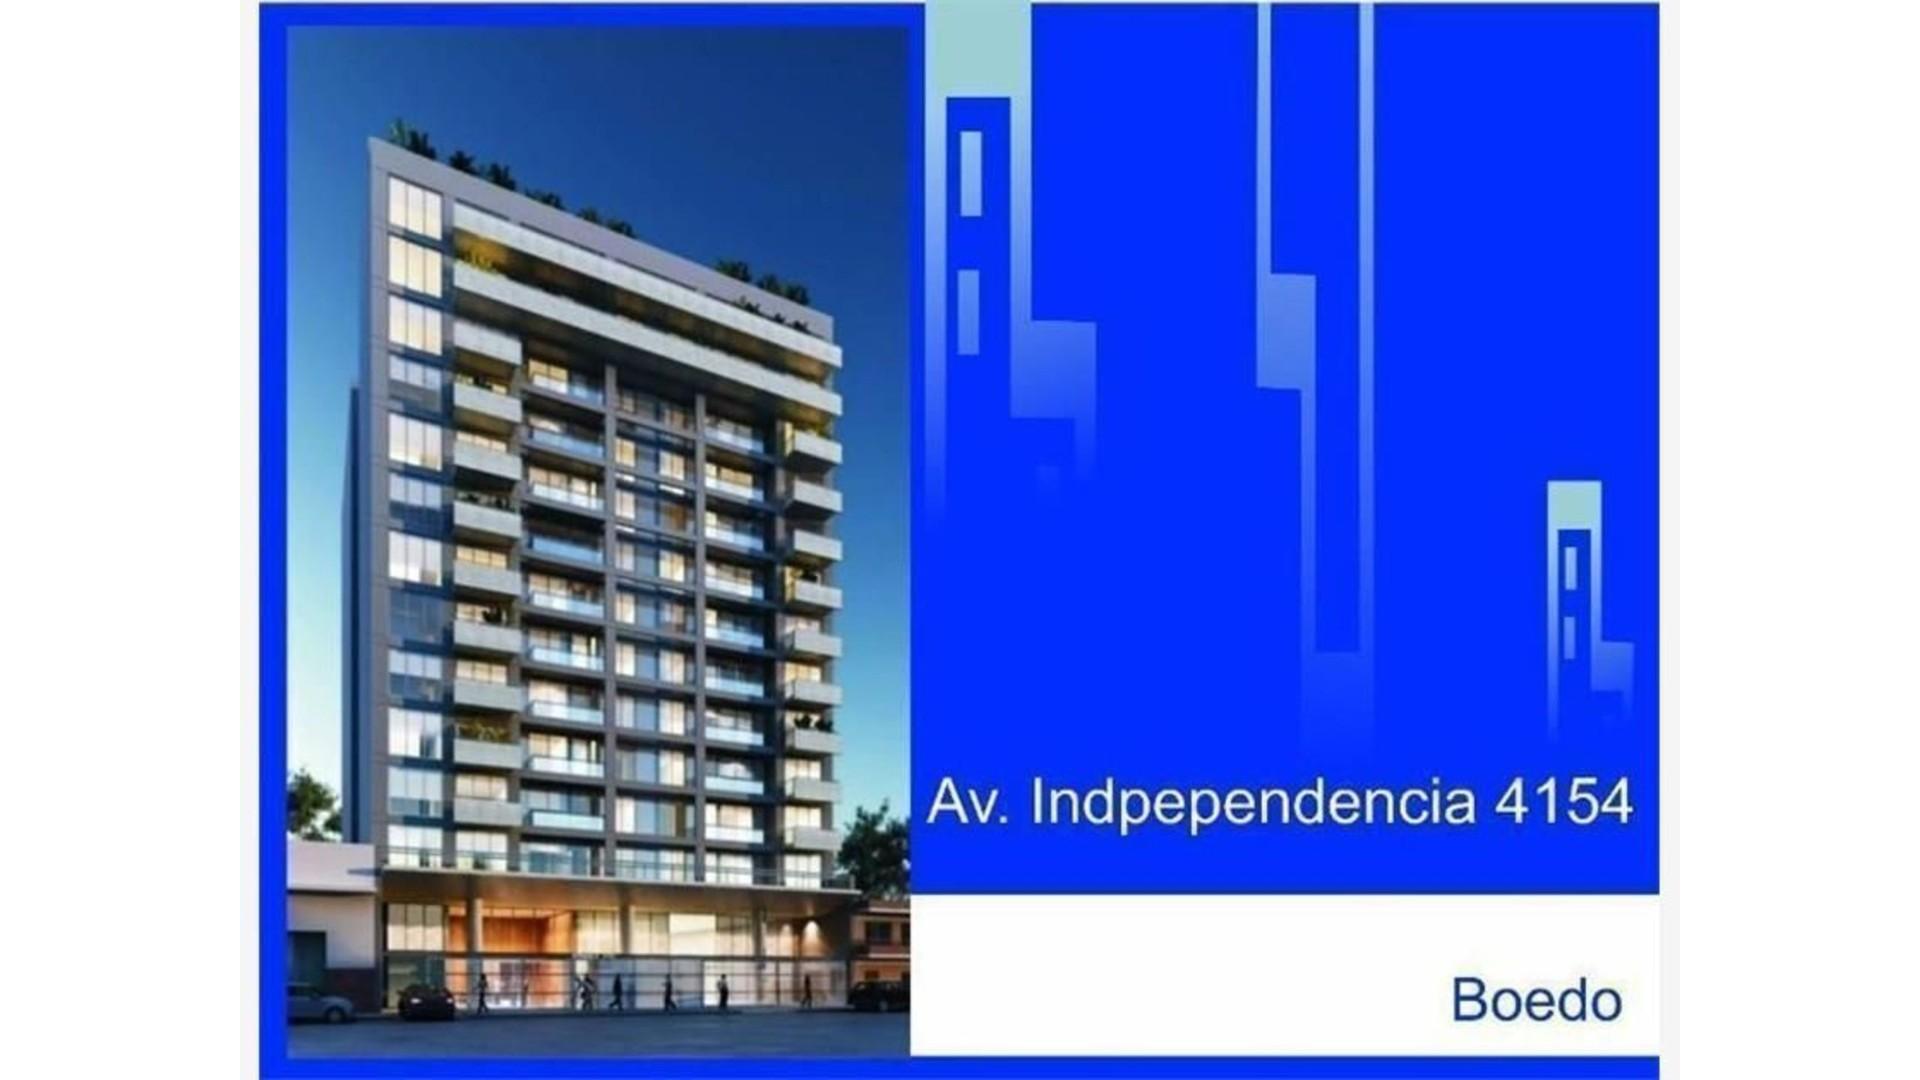 Av.Independencia 4154 8 º Boedo